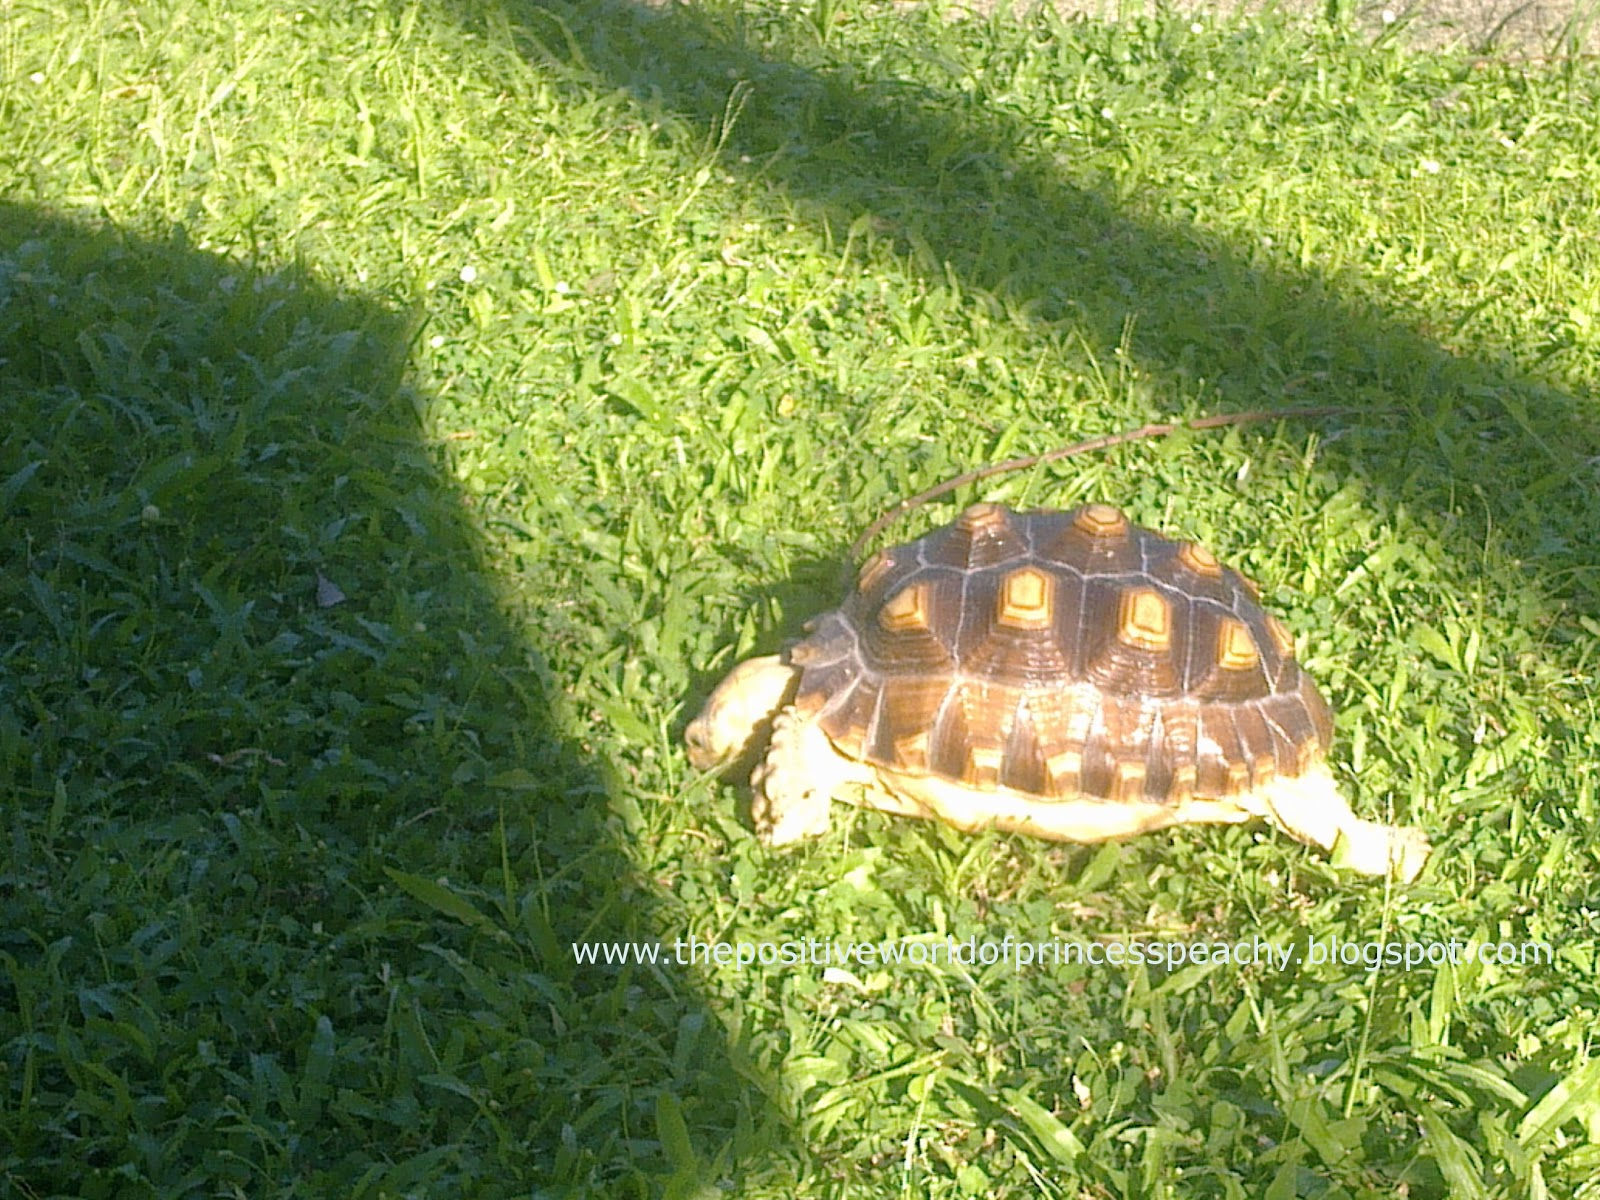 The Positive World Of Princess Peachy, The Happy Sulcata Tortoise: 2012